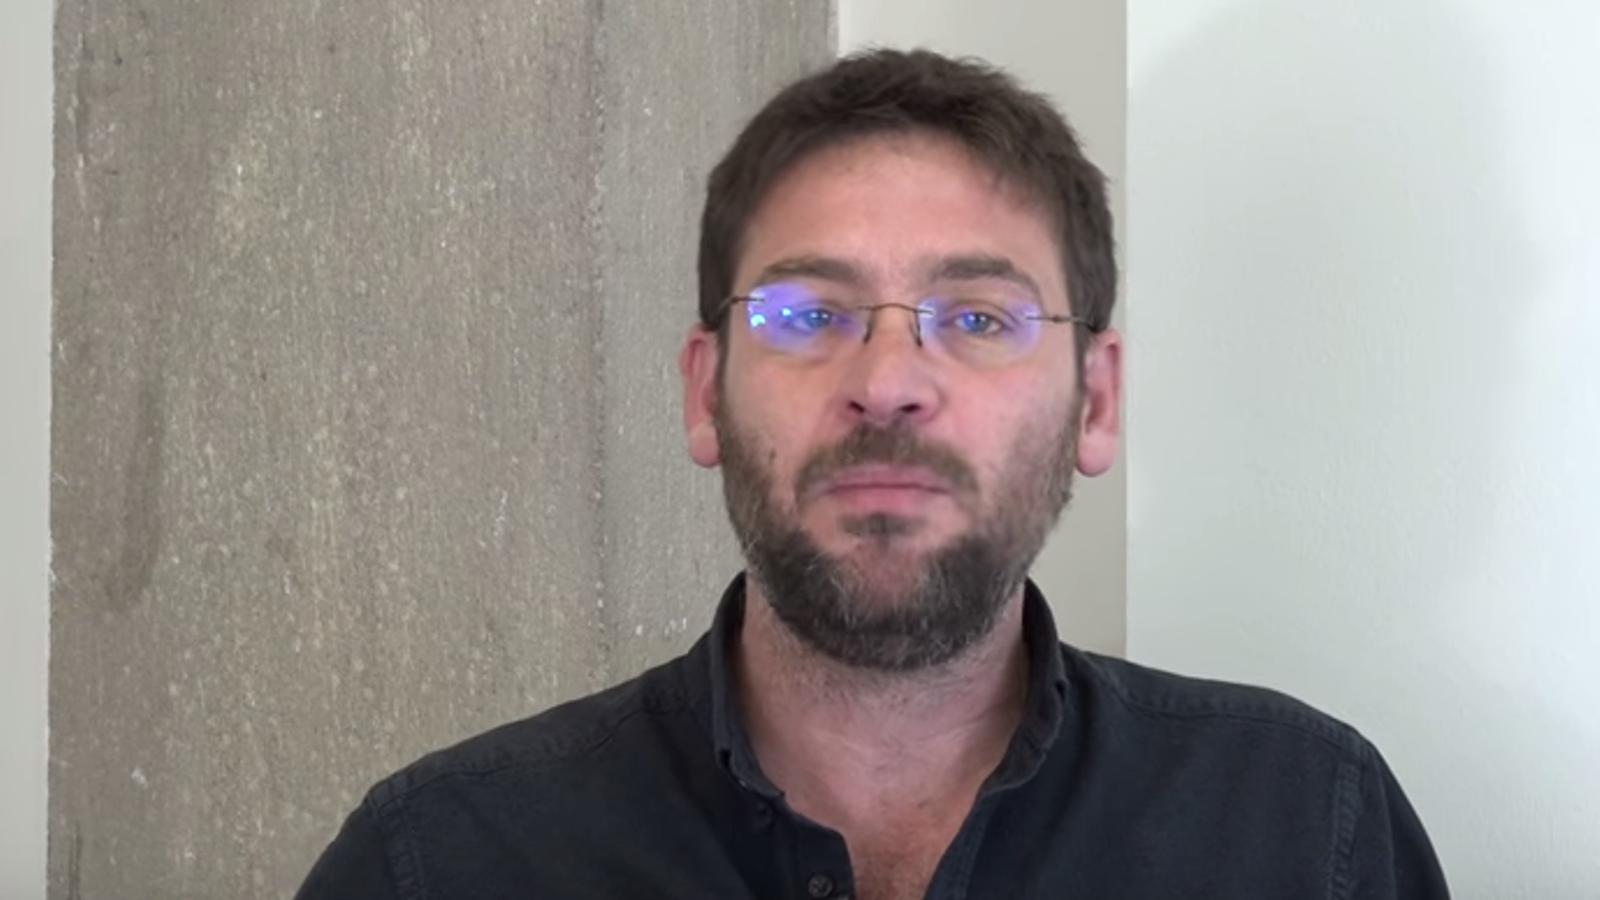 El vídeo d'Albano-Dante Fachin dirigit als indecisos